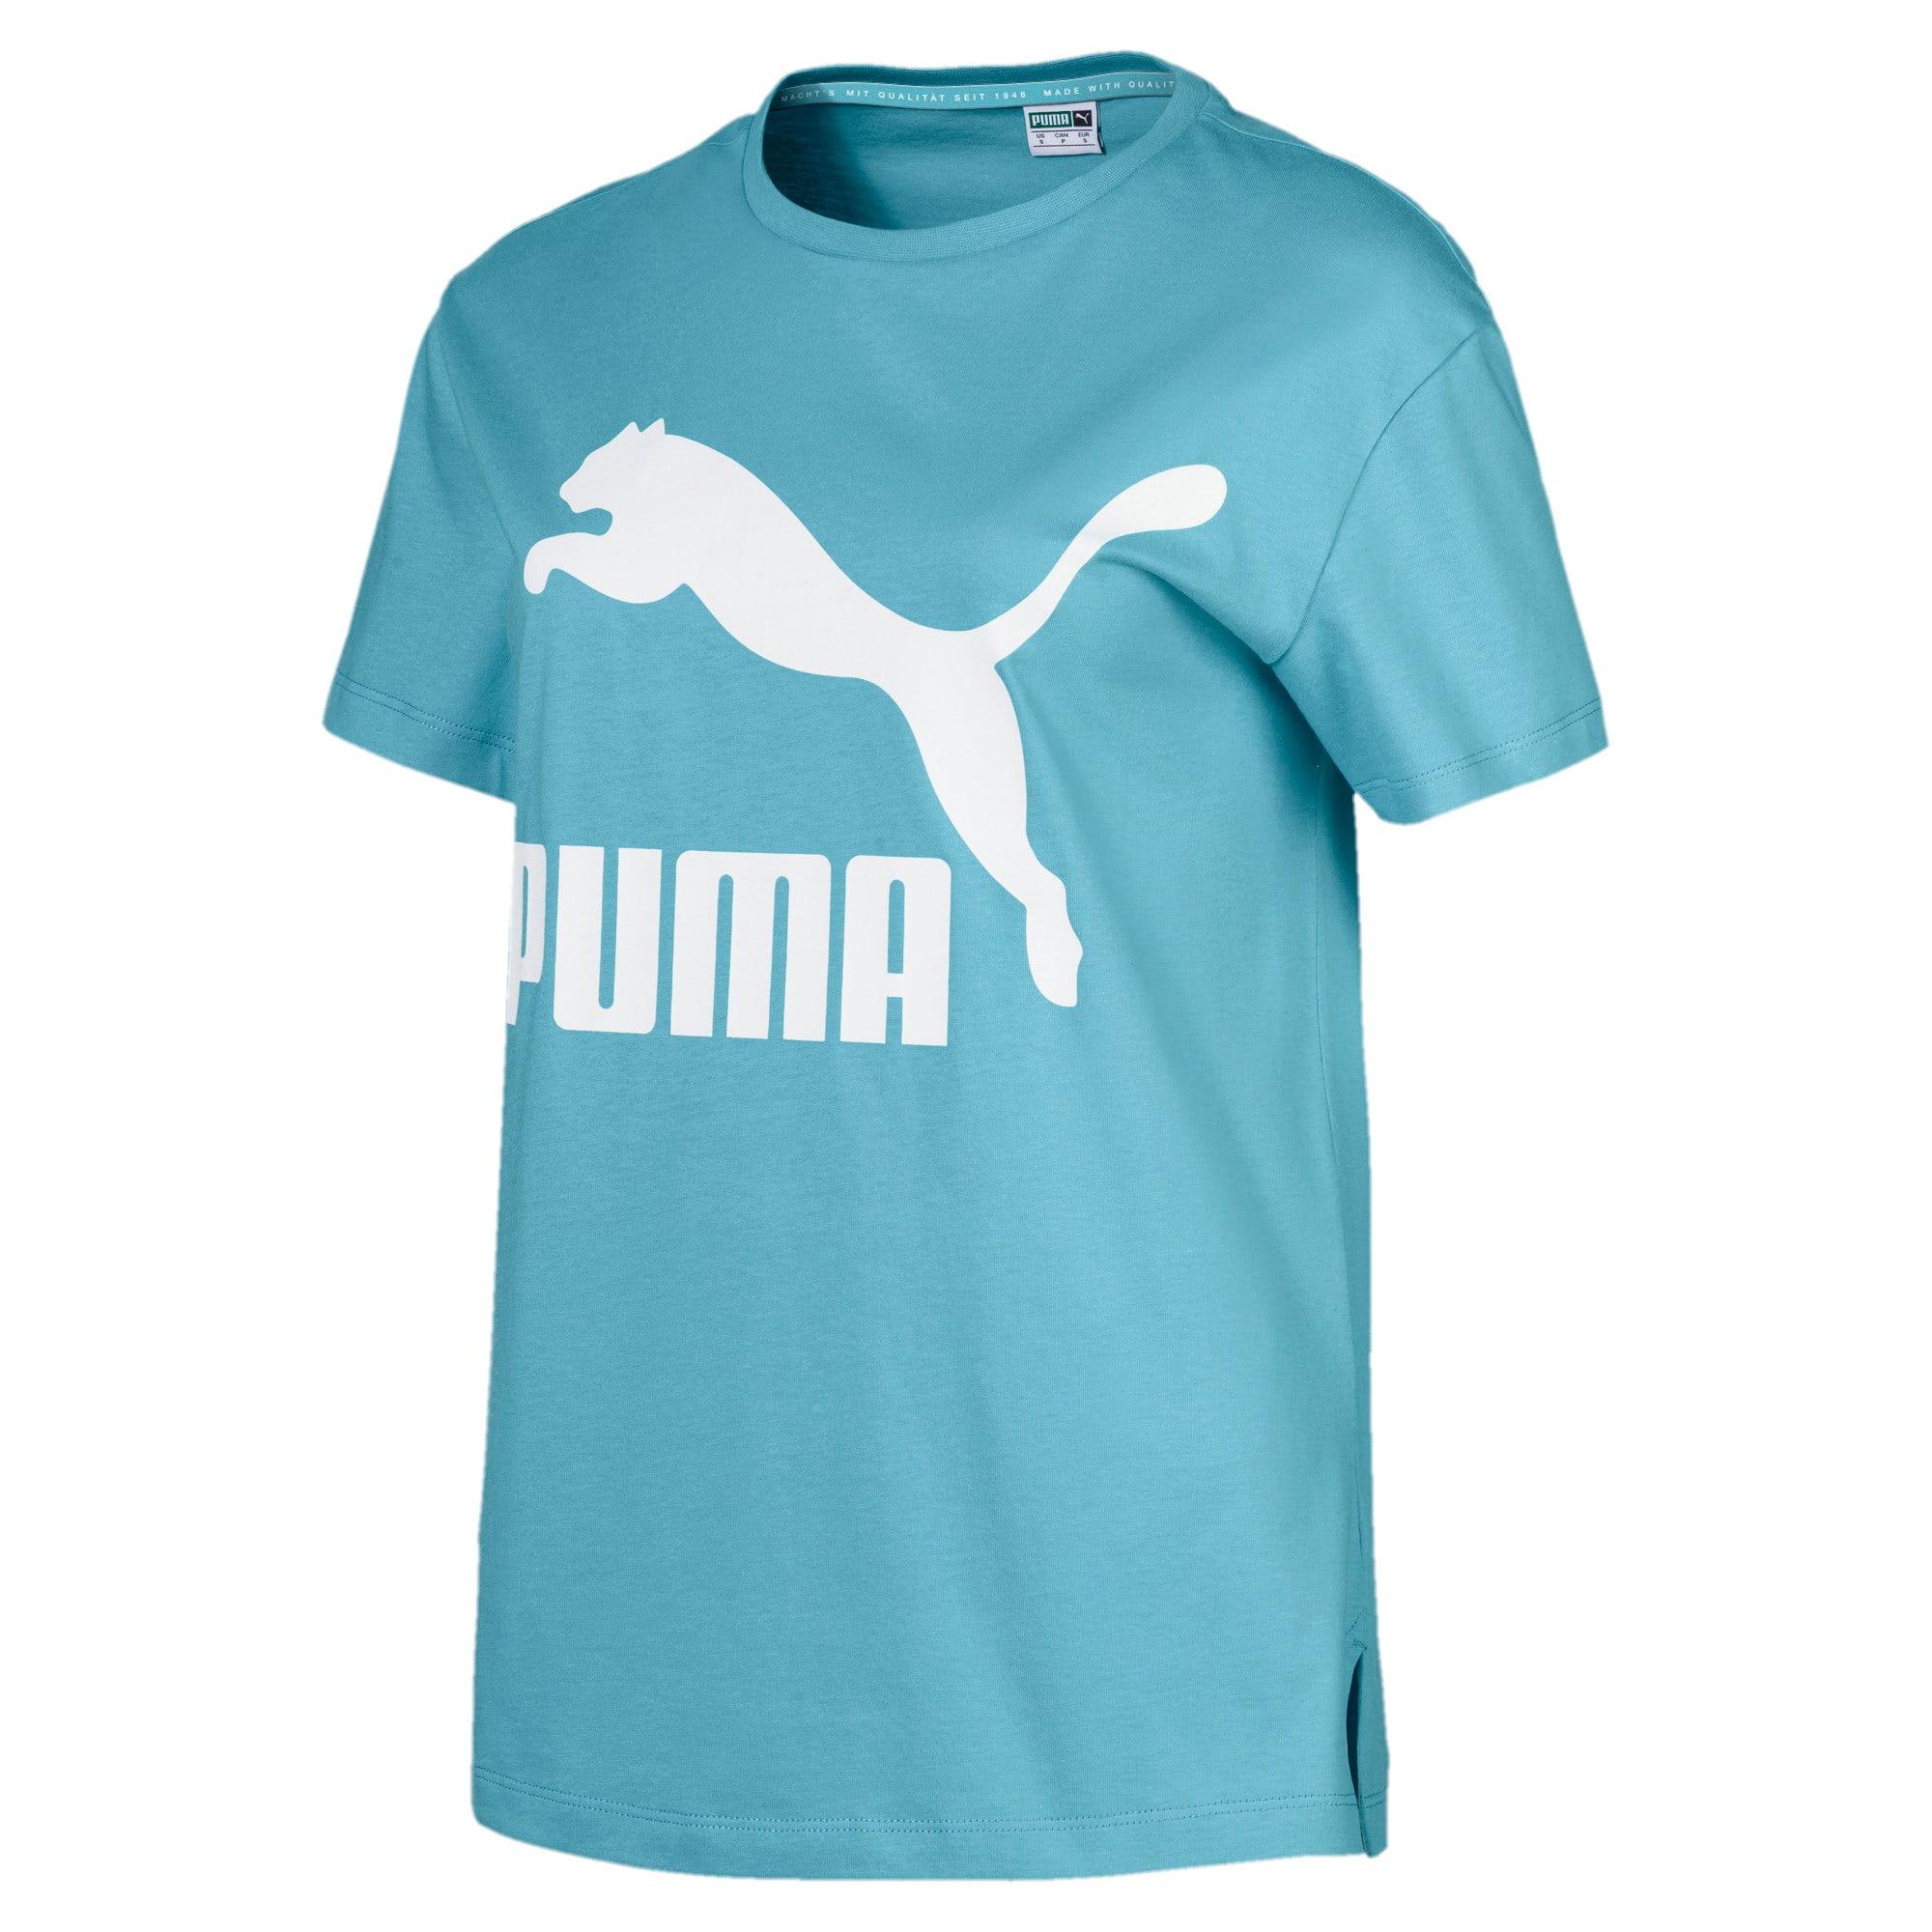 Thumbnail 4 of Classics Logo T-shirt voor dames, Milky Blue, medium